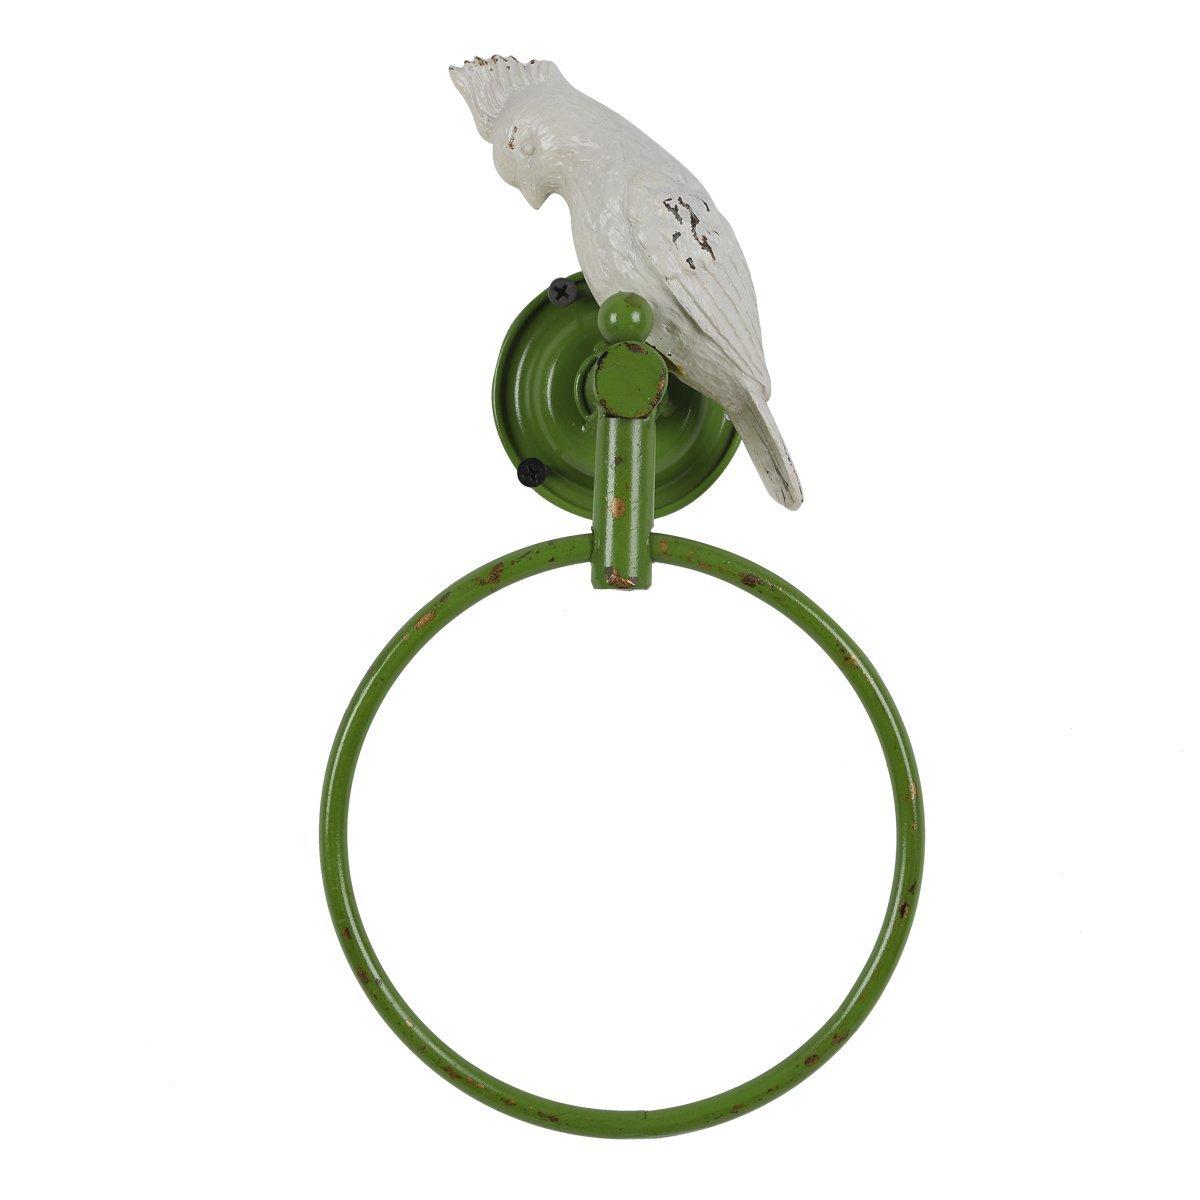 Vintage Parrot Metal Bird Wall Mount Towel Ring Holder,Green White